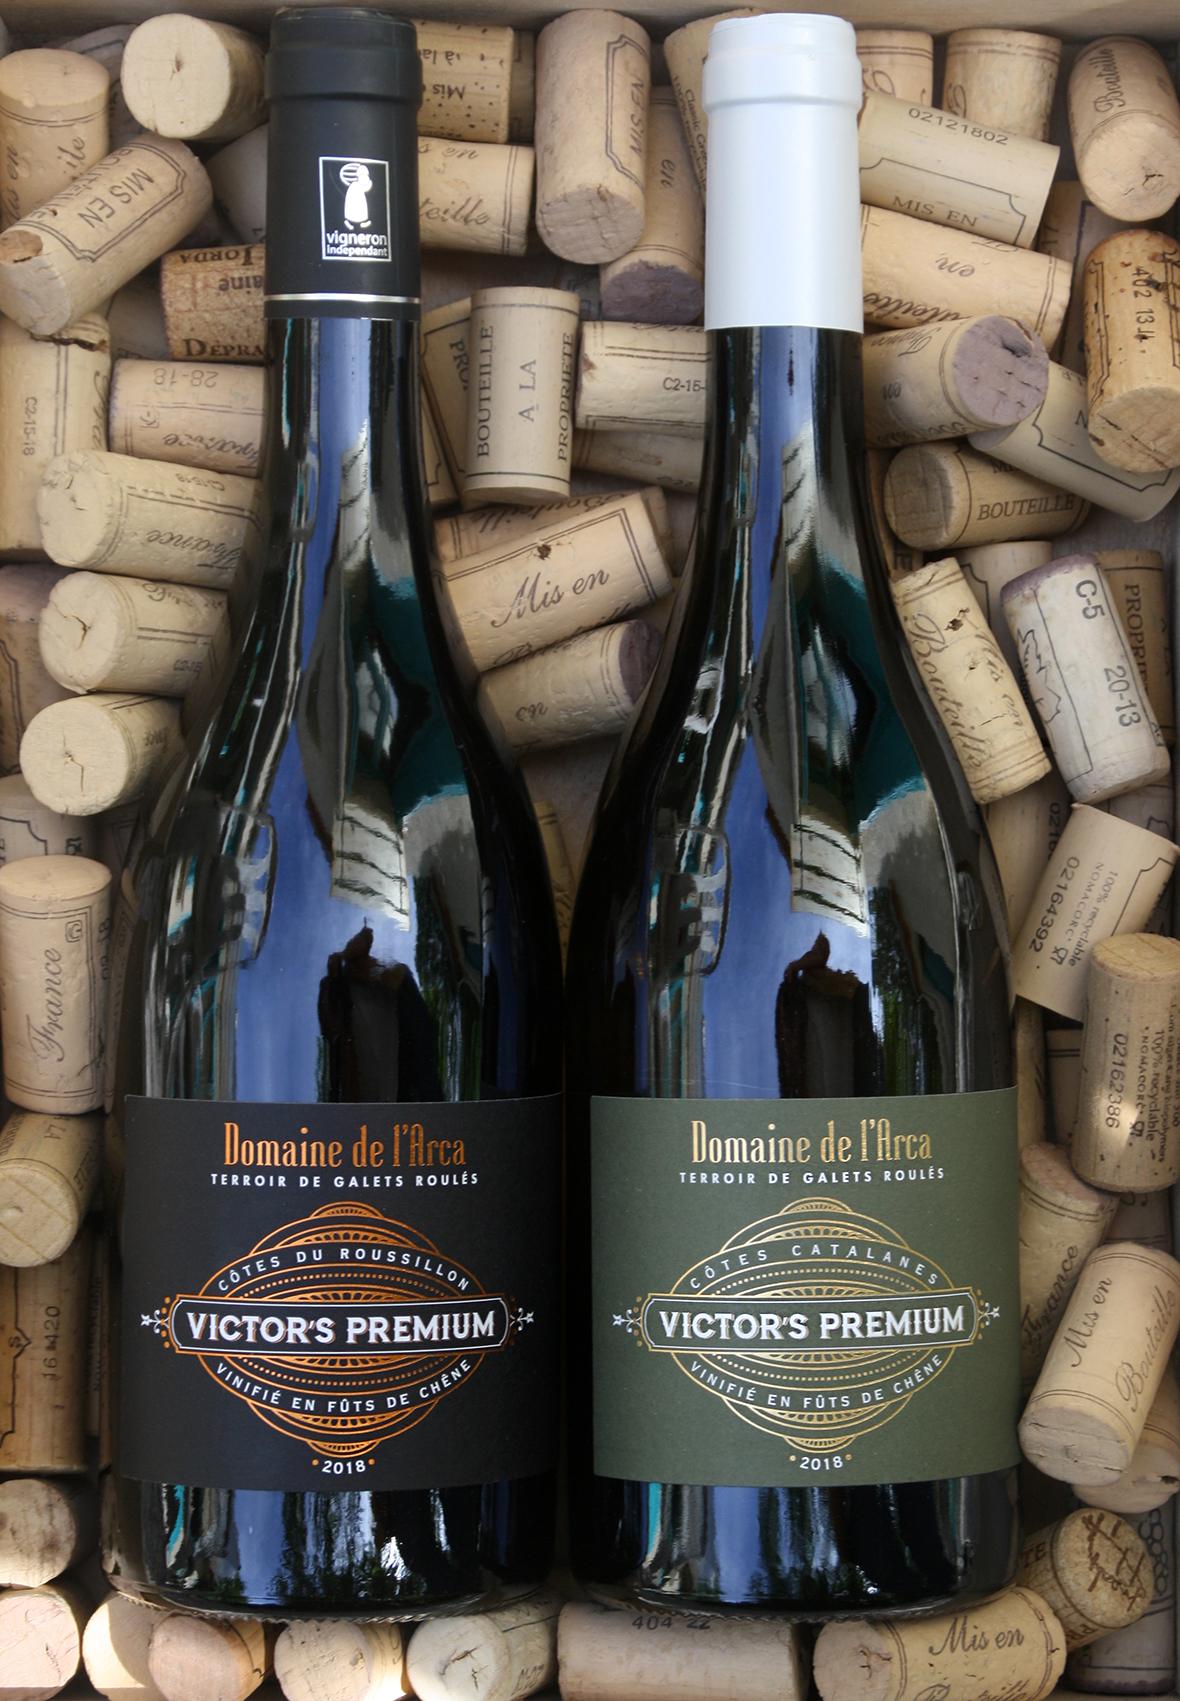 Victor's Premium